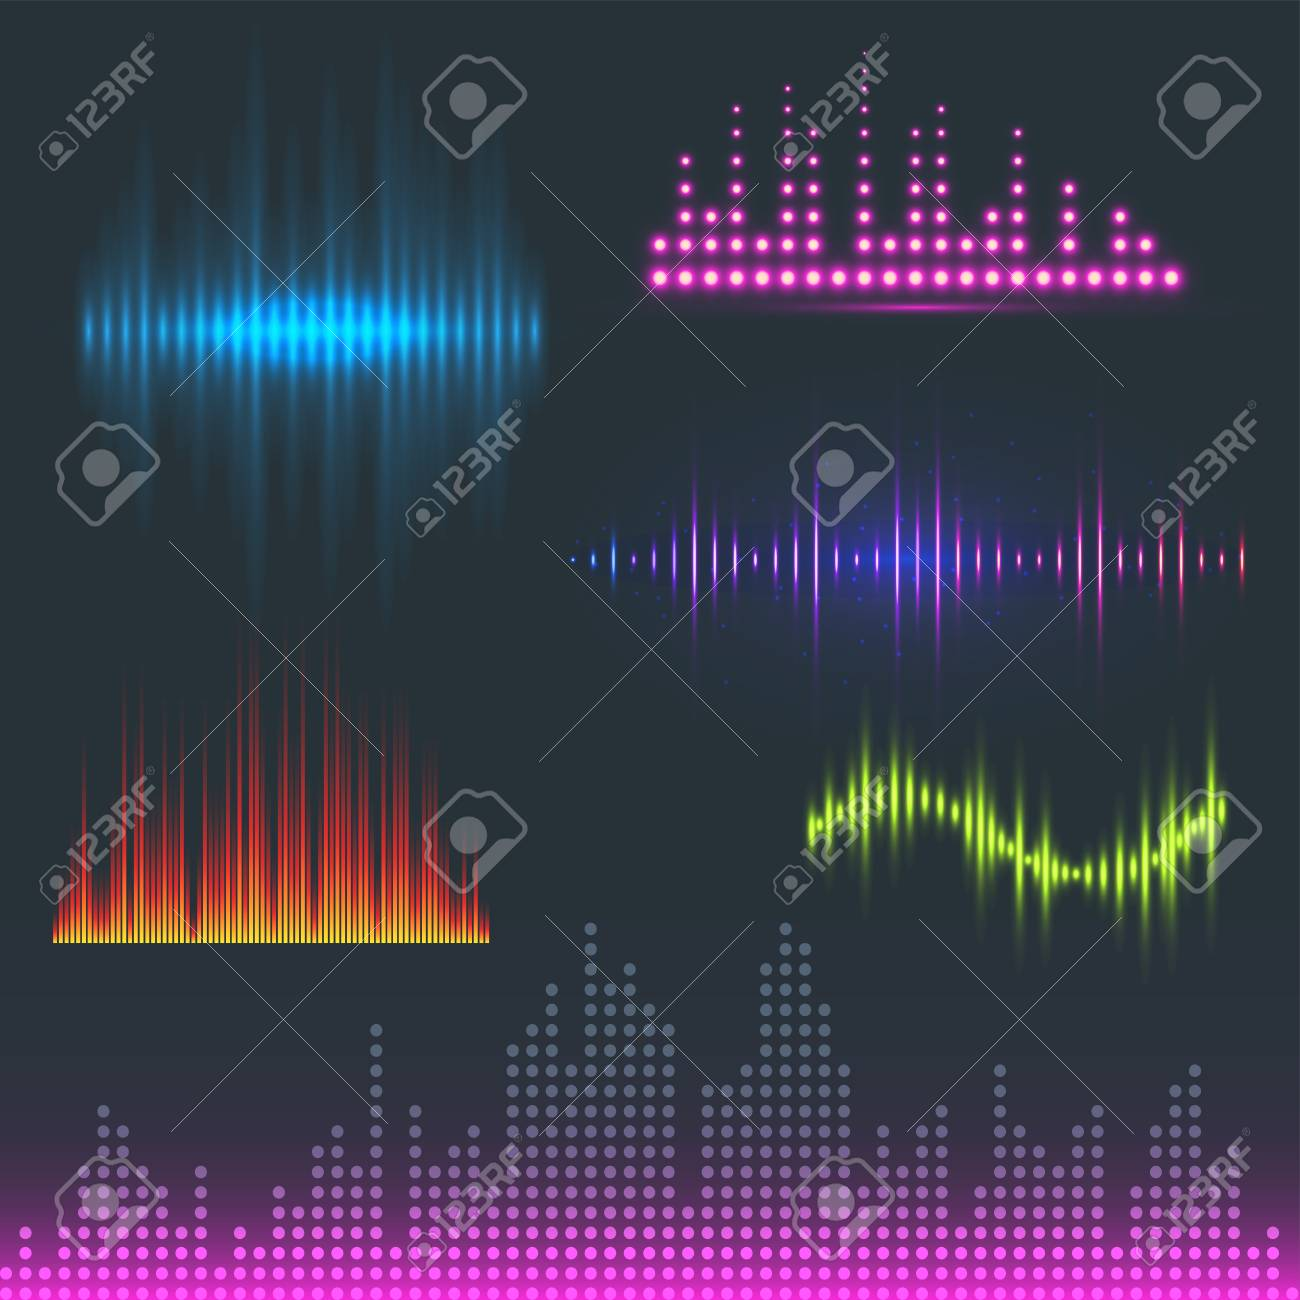 Digital music equalizer audio waves design template audio signal